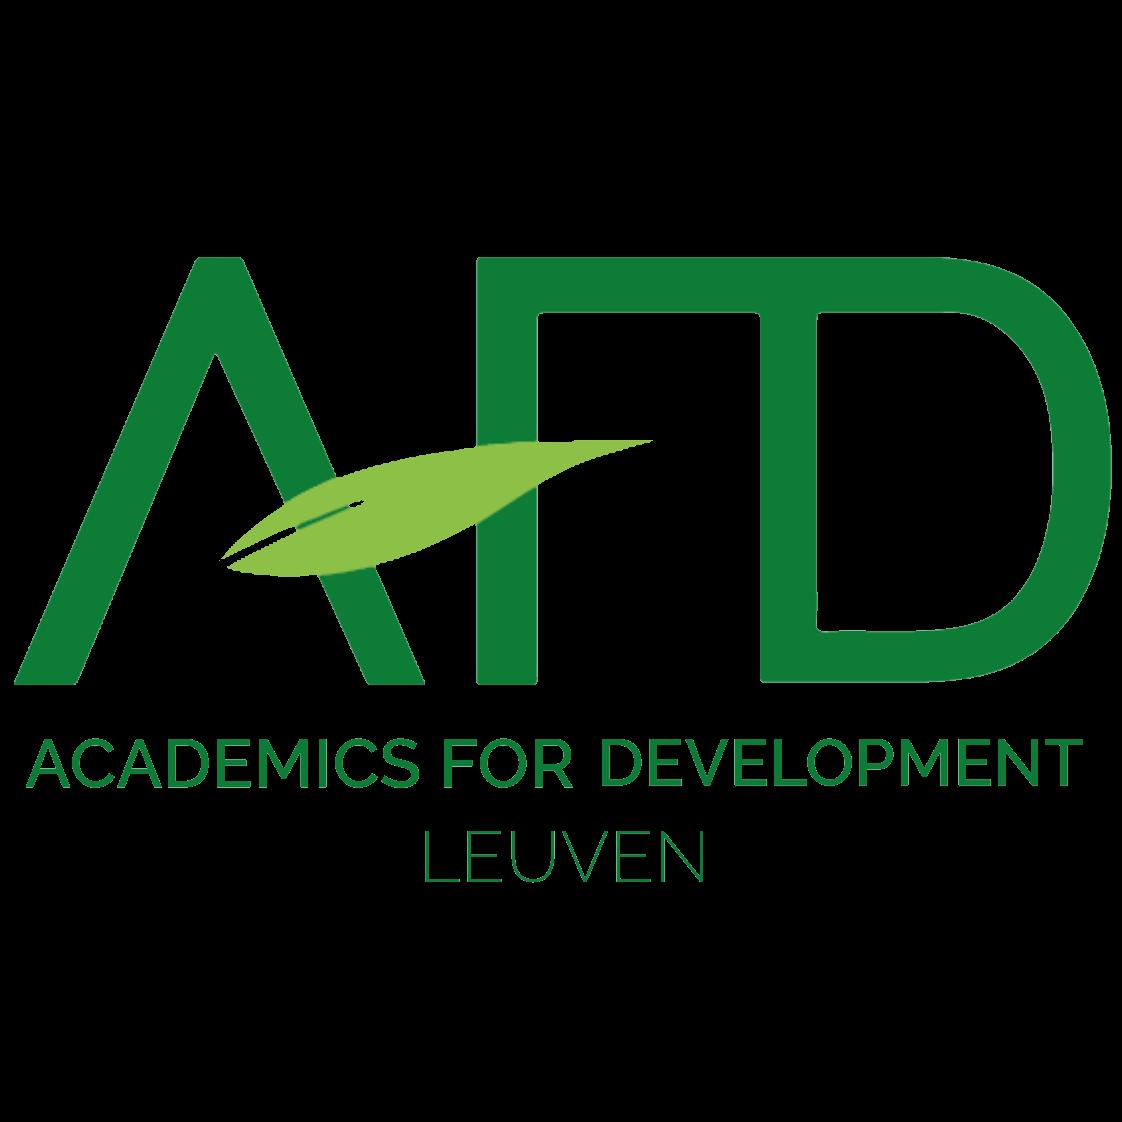 Academics for Development Leuven